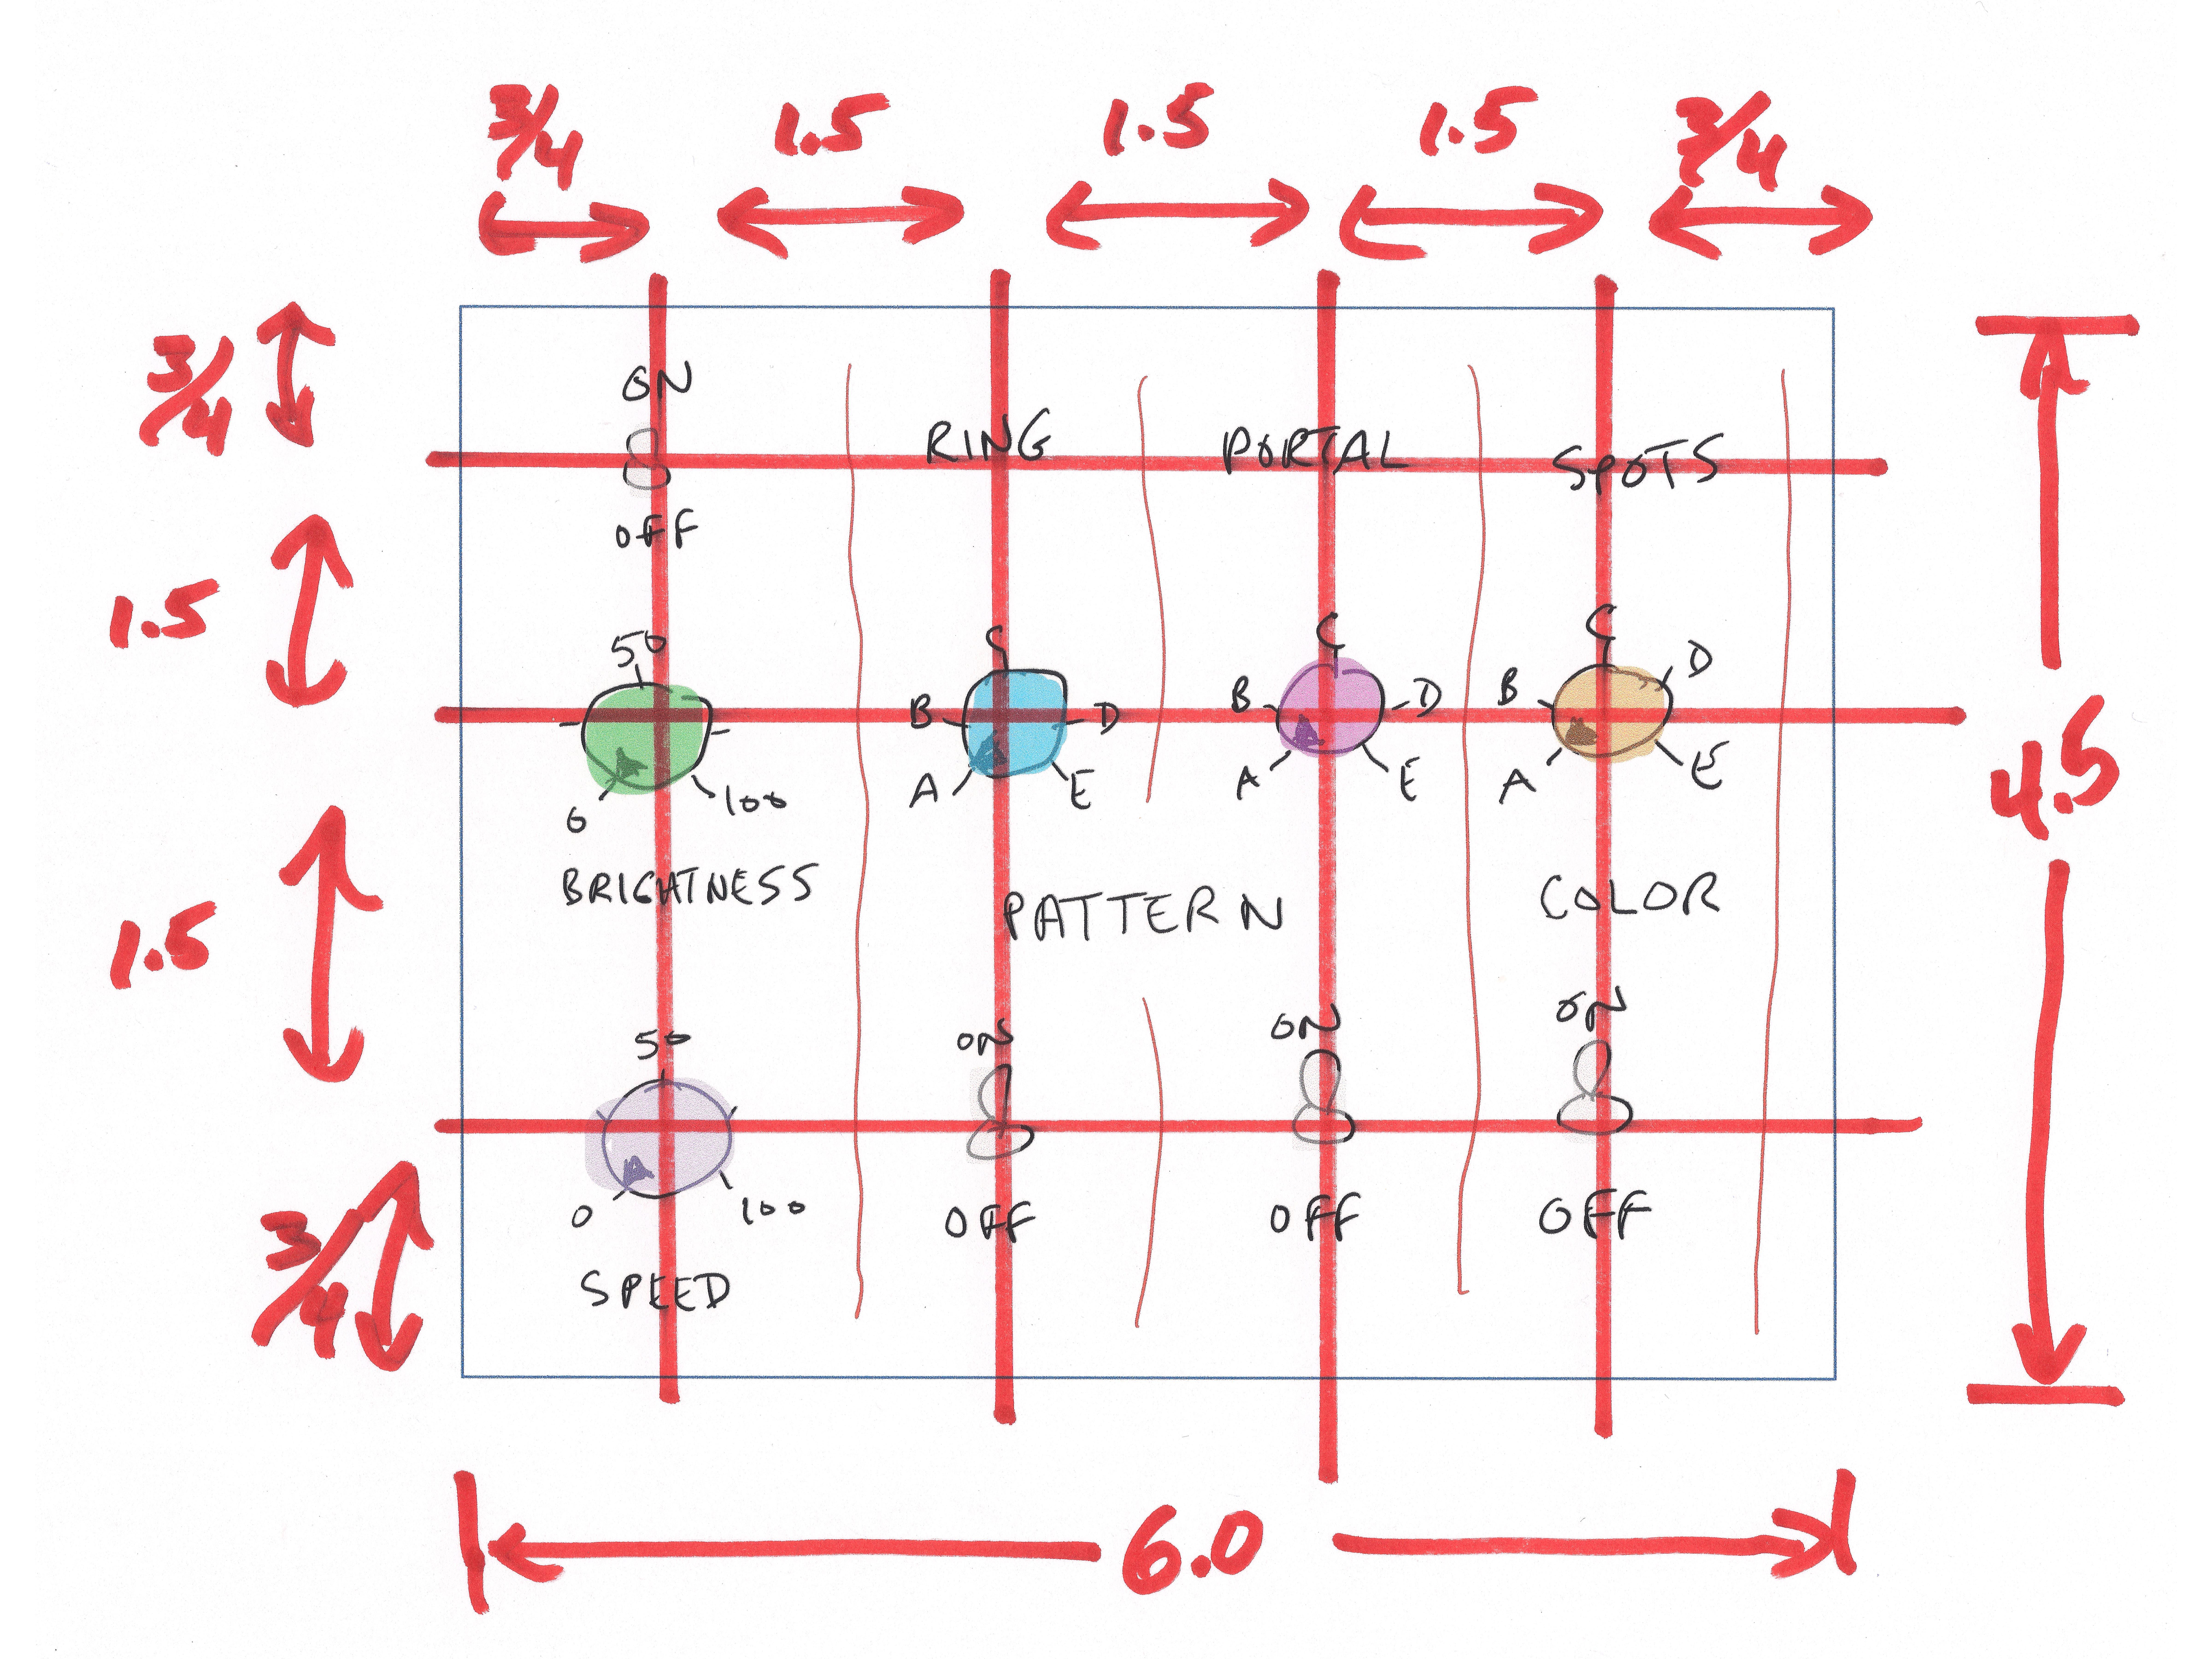 hand_tools_saucer_panel_v01_markup.jpg